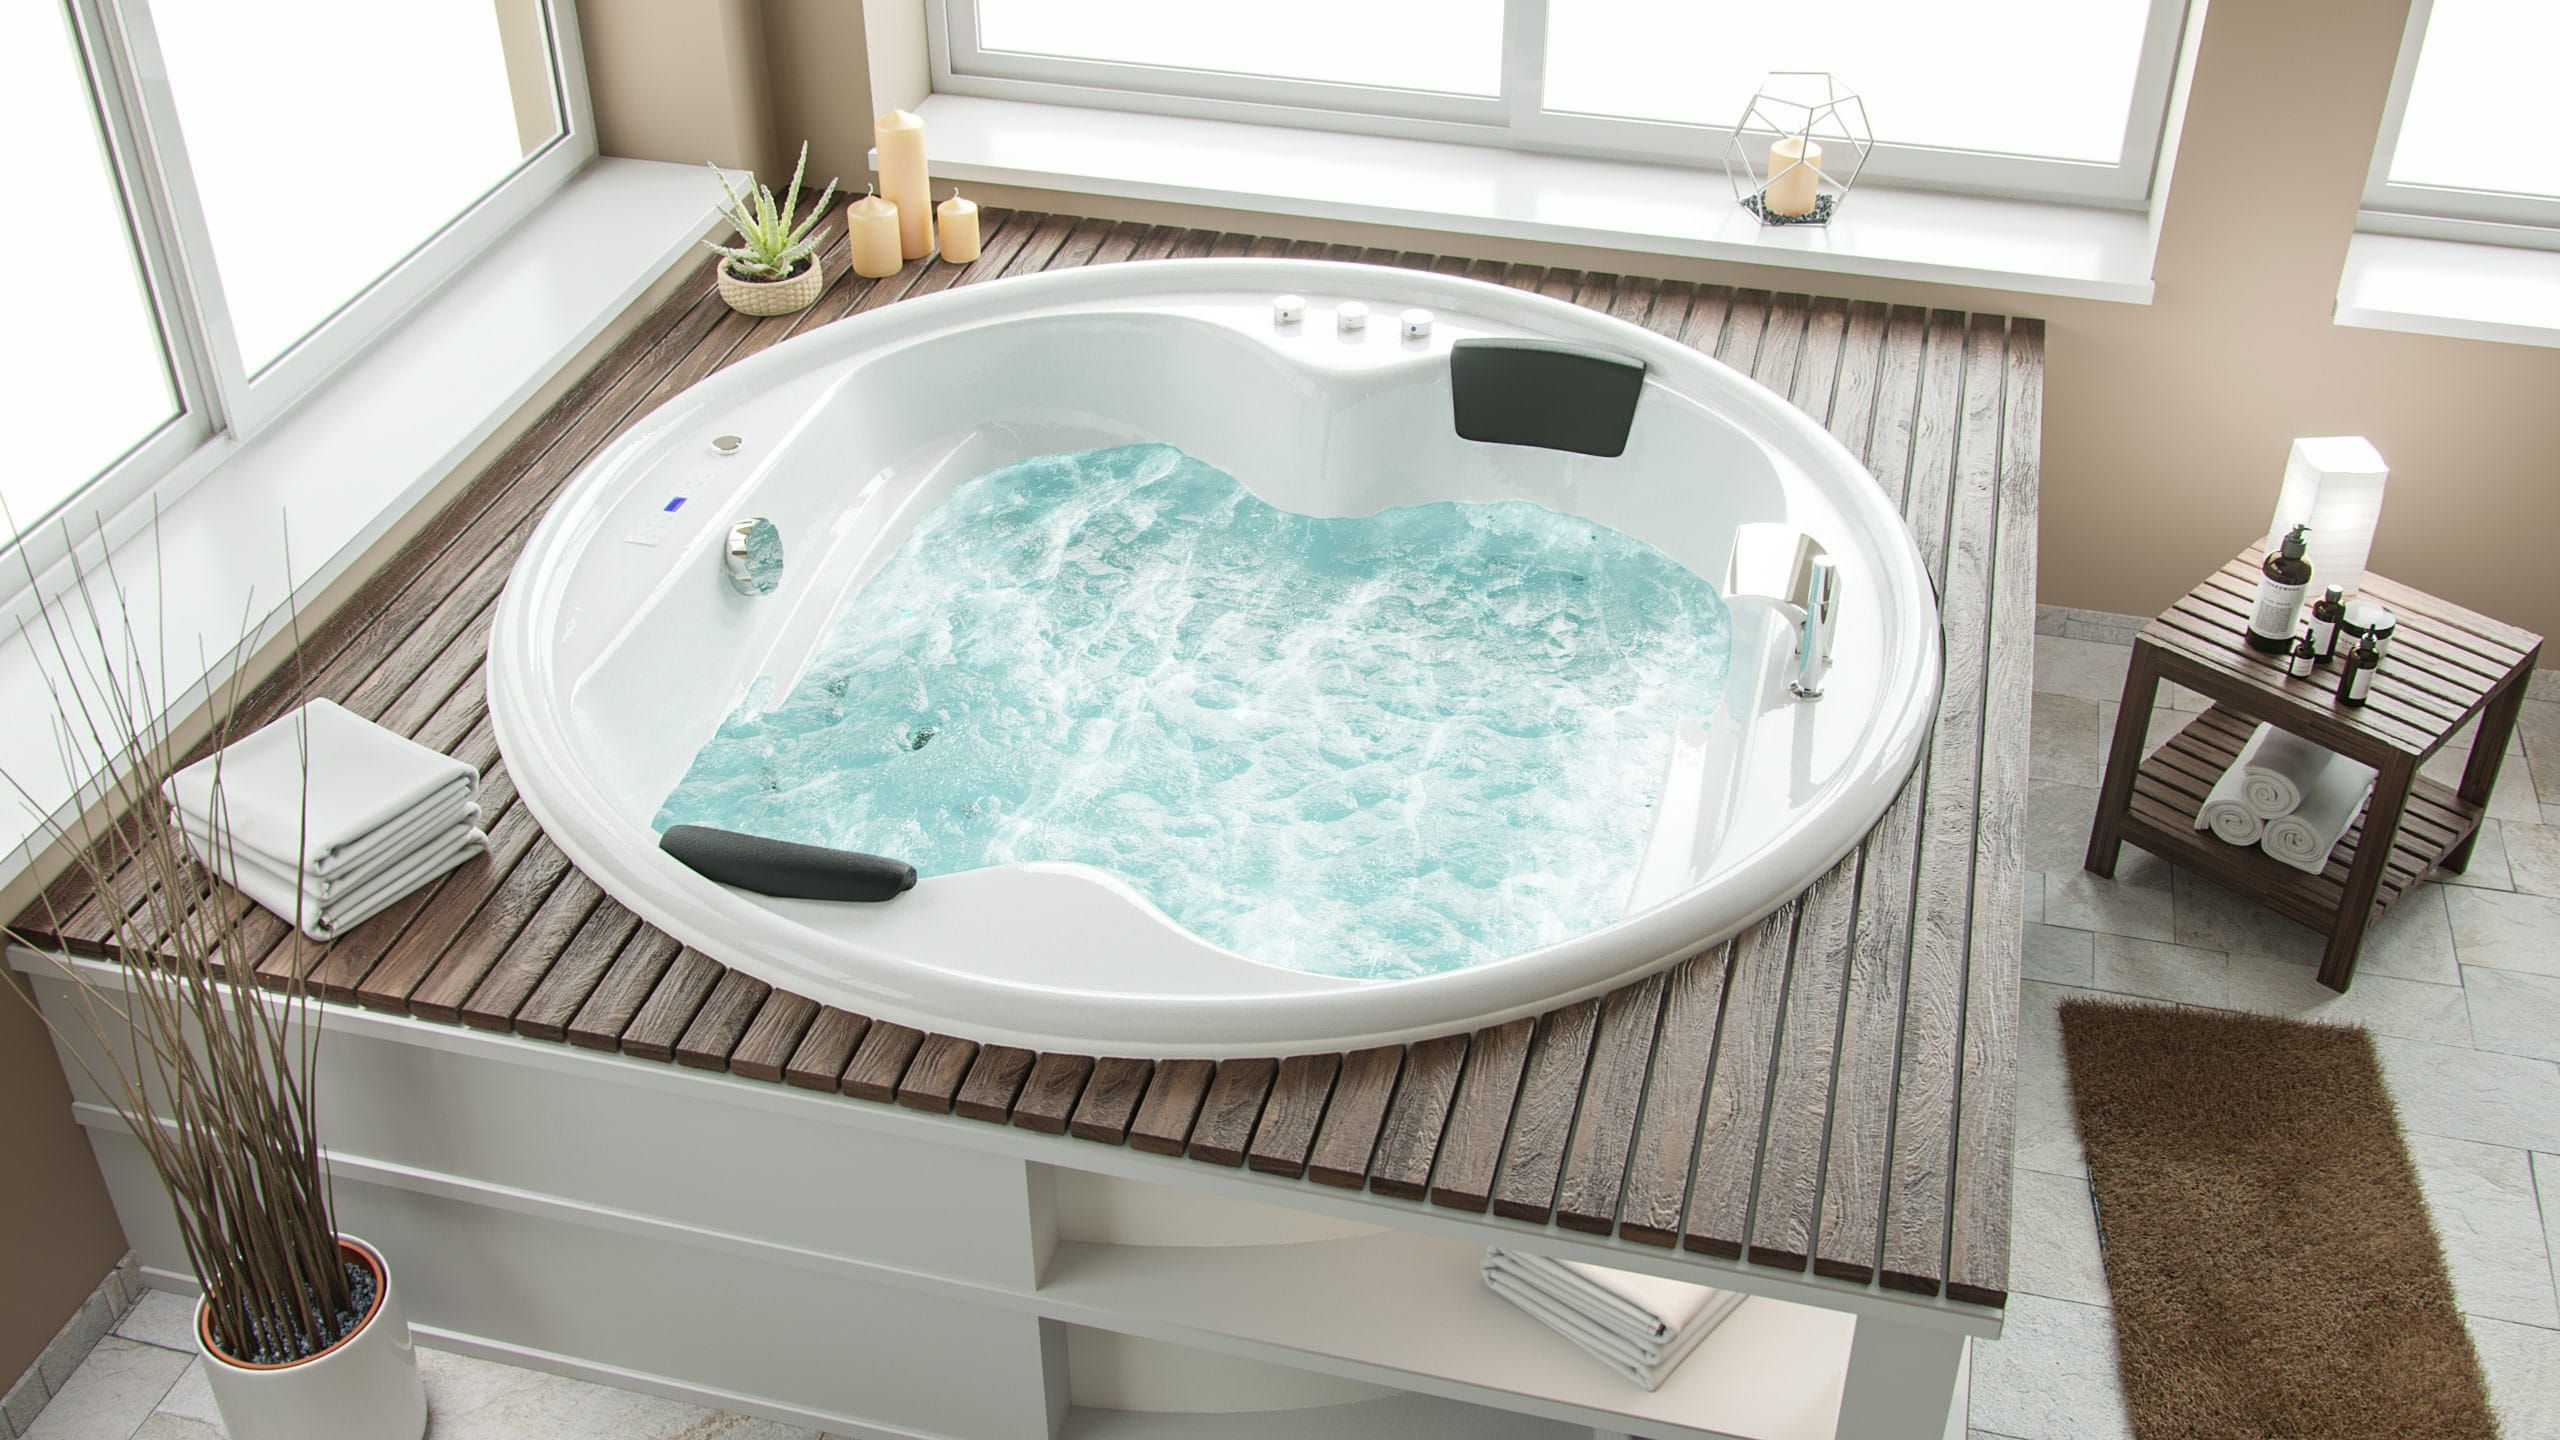 Whirlpool Saturn Rund Premium in 2020 Whirlpool